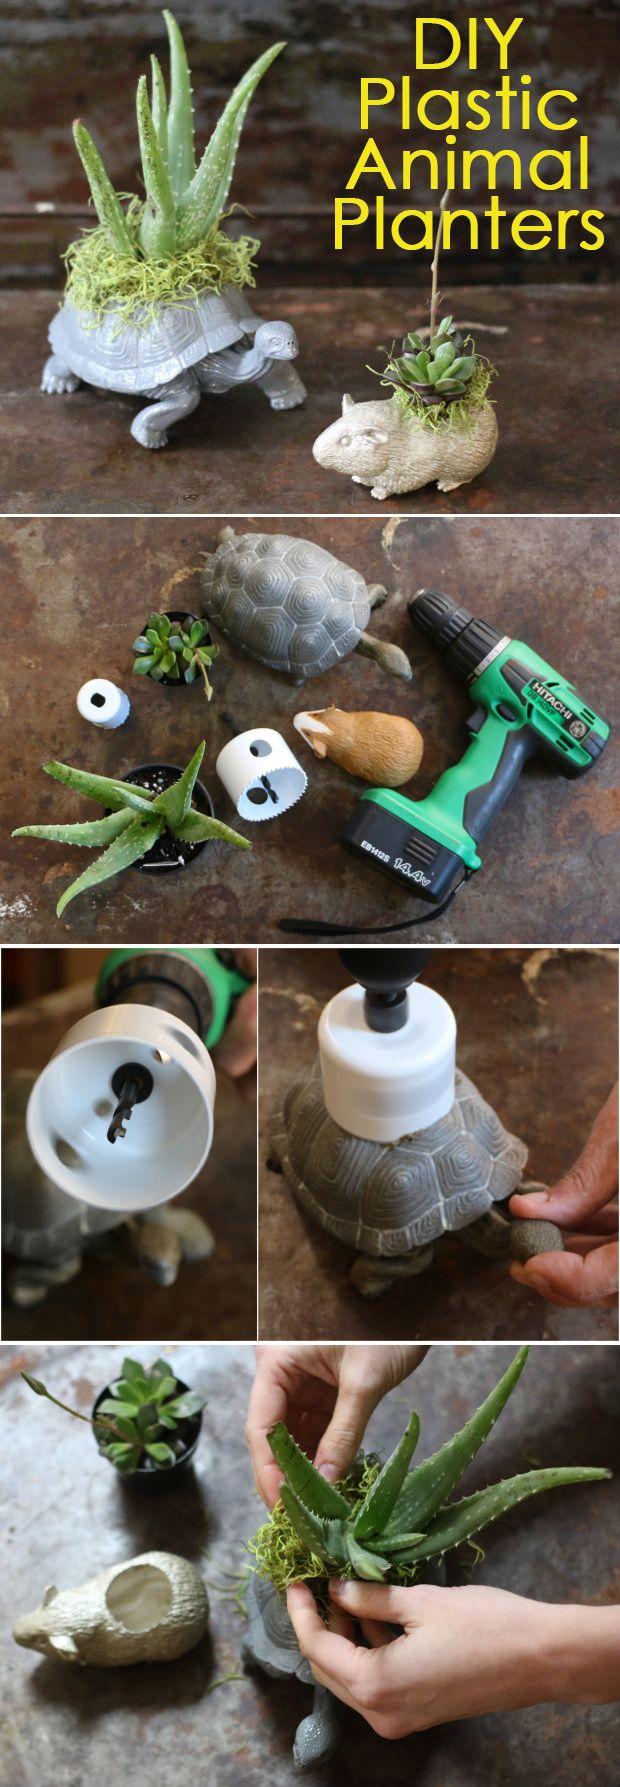 How cute! Transform plastic animals into planters!